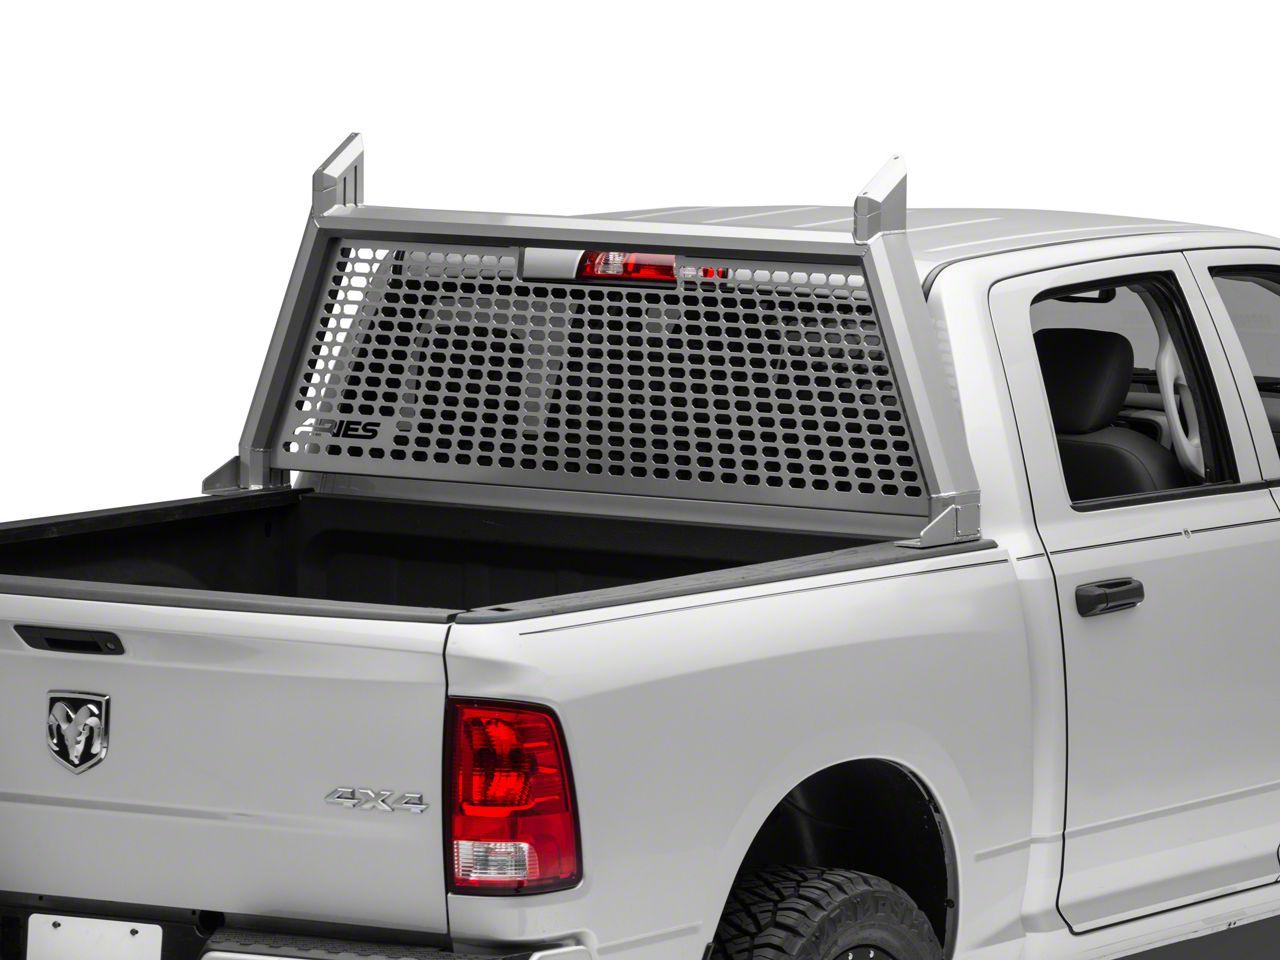 Aries Automotive AdvantEDGE Headache Rack - Chrome (09-18 RAM 1500 w/o RAM Box)